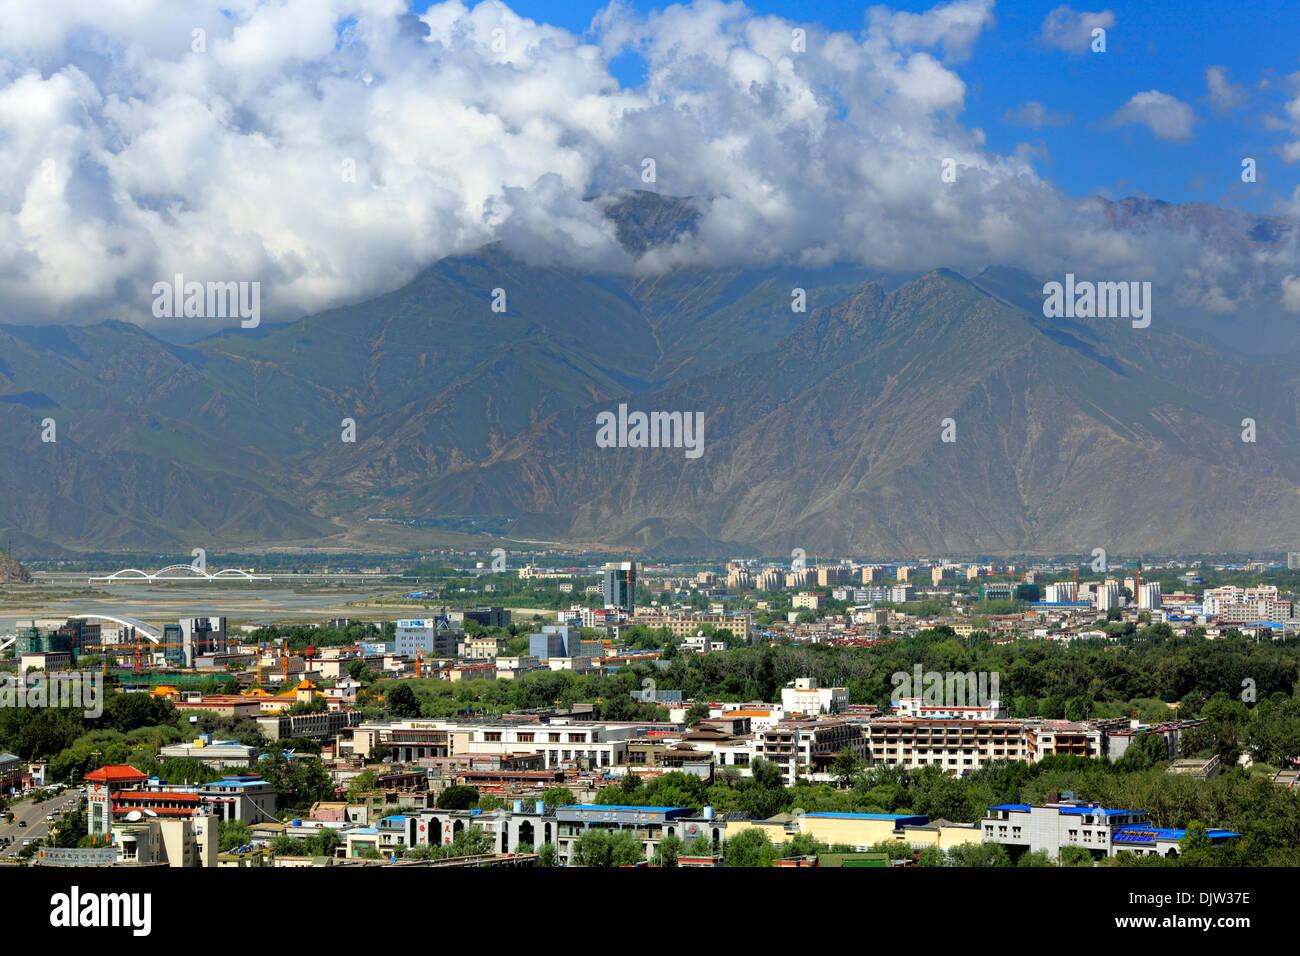 View of Lhasa city from Potala Palace, Lhasa, Tibet, China - Stock Image